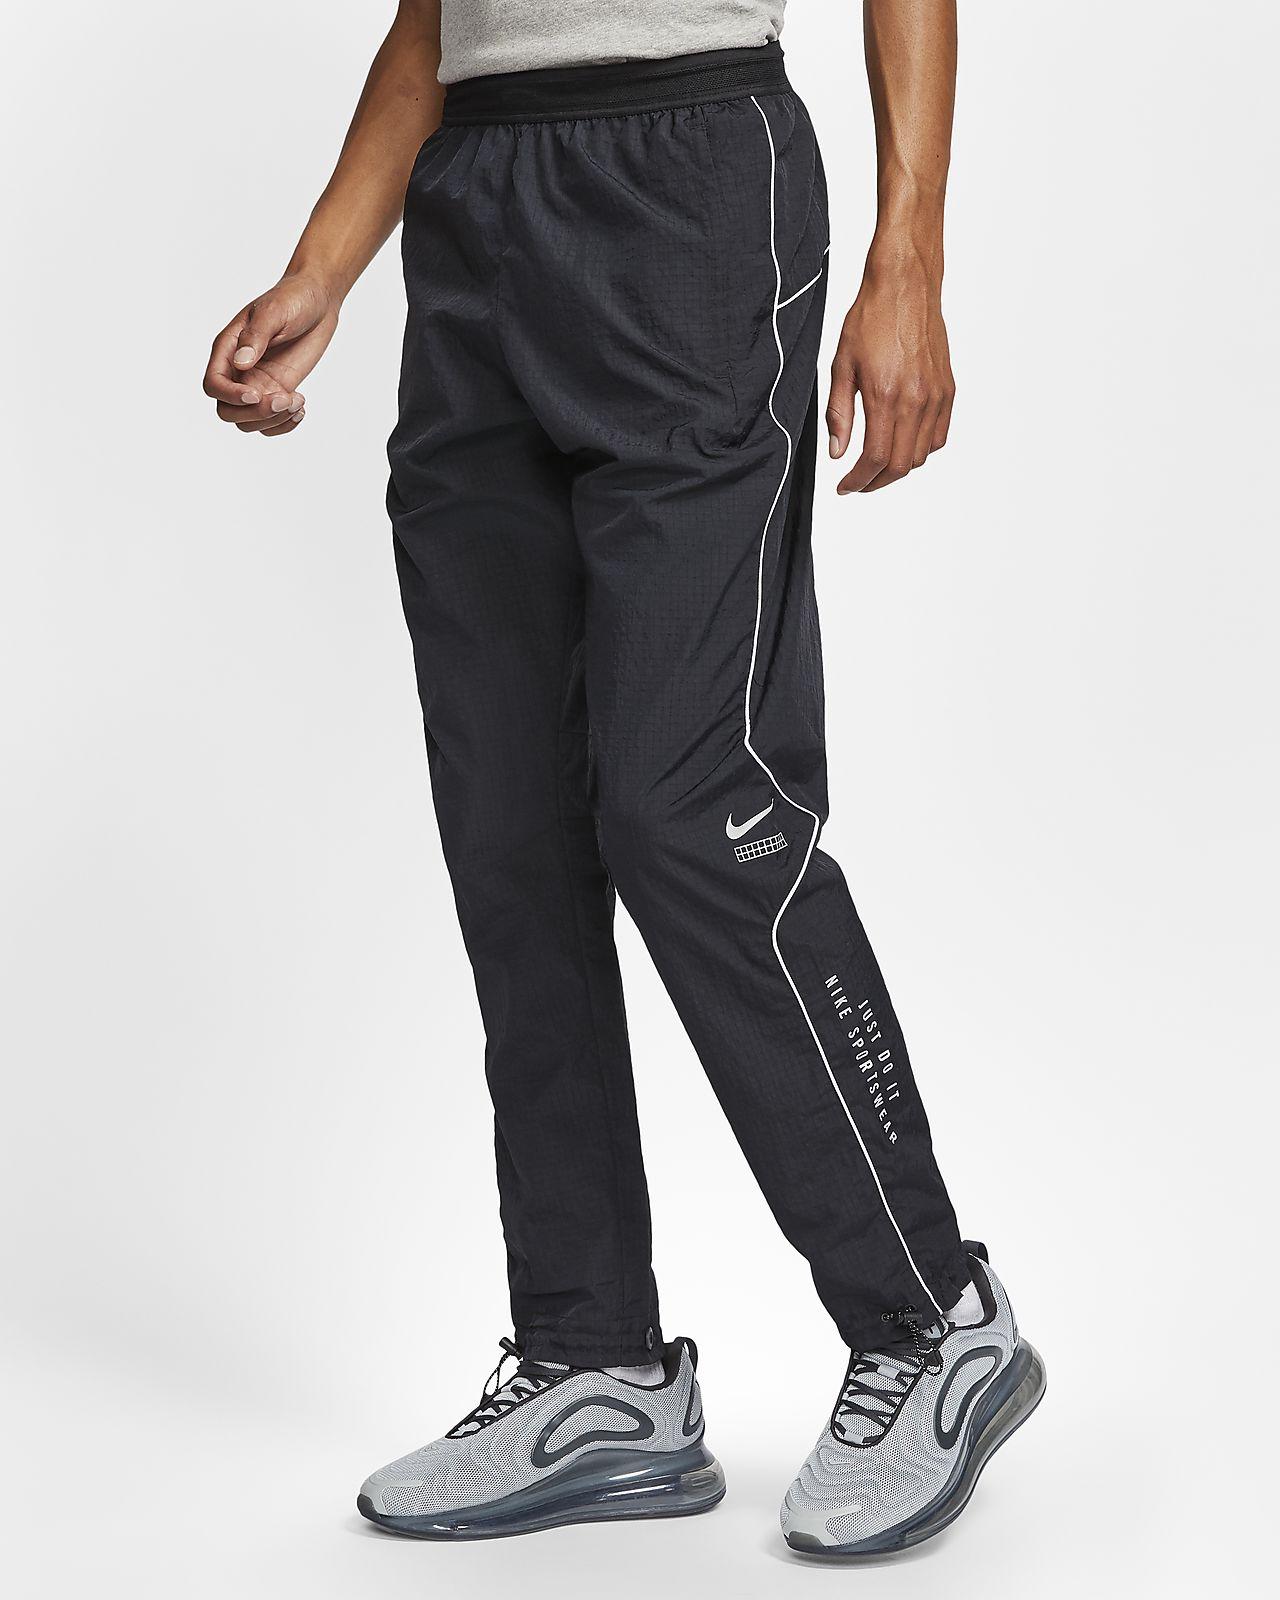 Nike Sportswear DNA Herren-Webhose